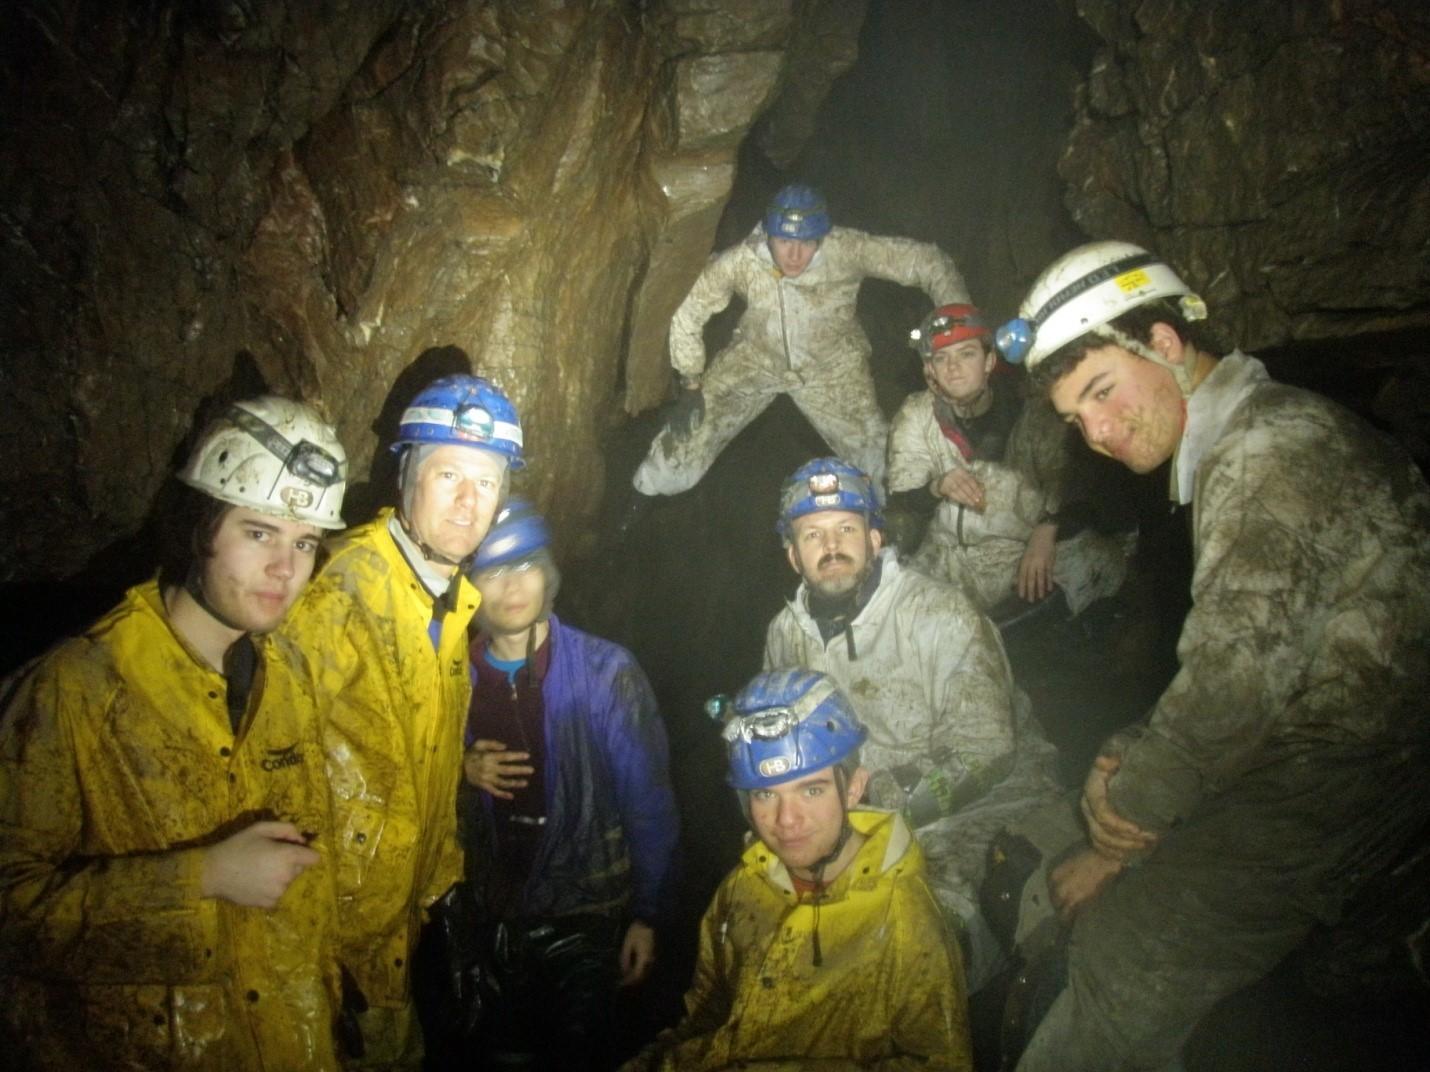 Troop 76 scouts take a break in Clarkesville Cave. Cole Starrett, Harry Starrett, Rigby Michaelsen, Justin Casalino, John Boysen, Brenton Arena, Tyler Drake, and Chris Weiland.